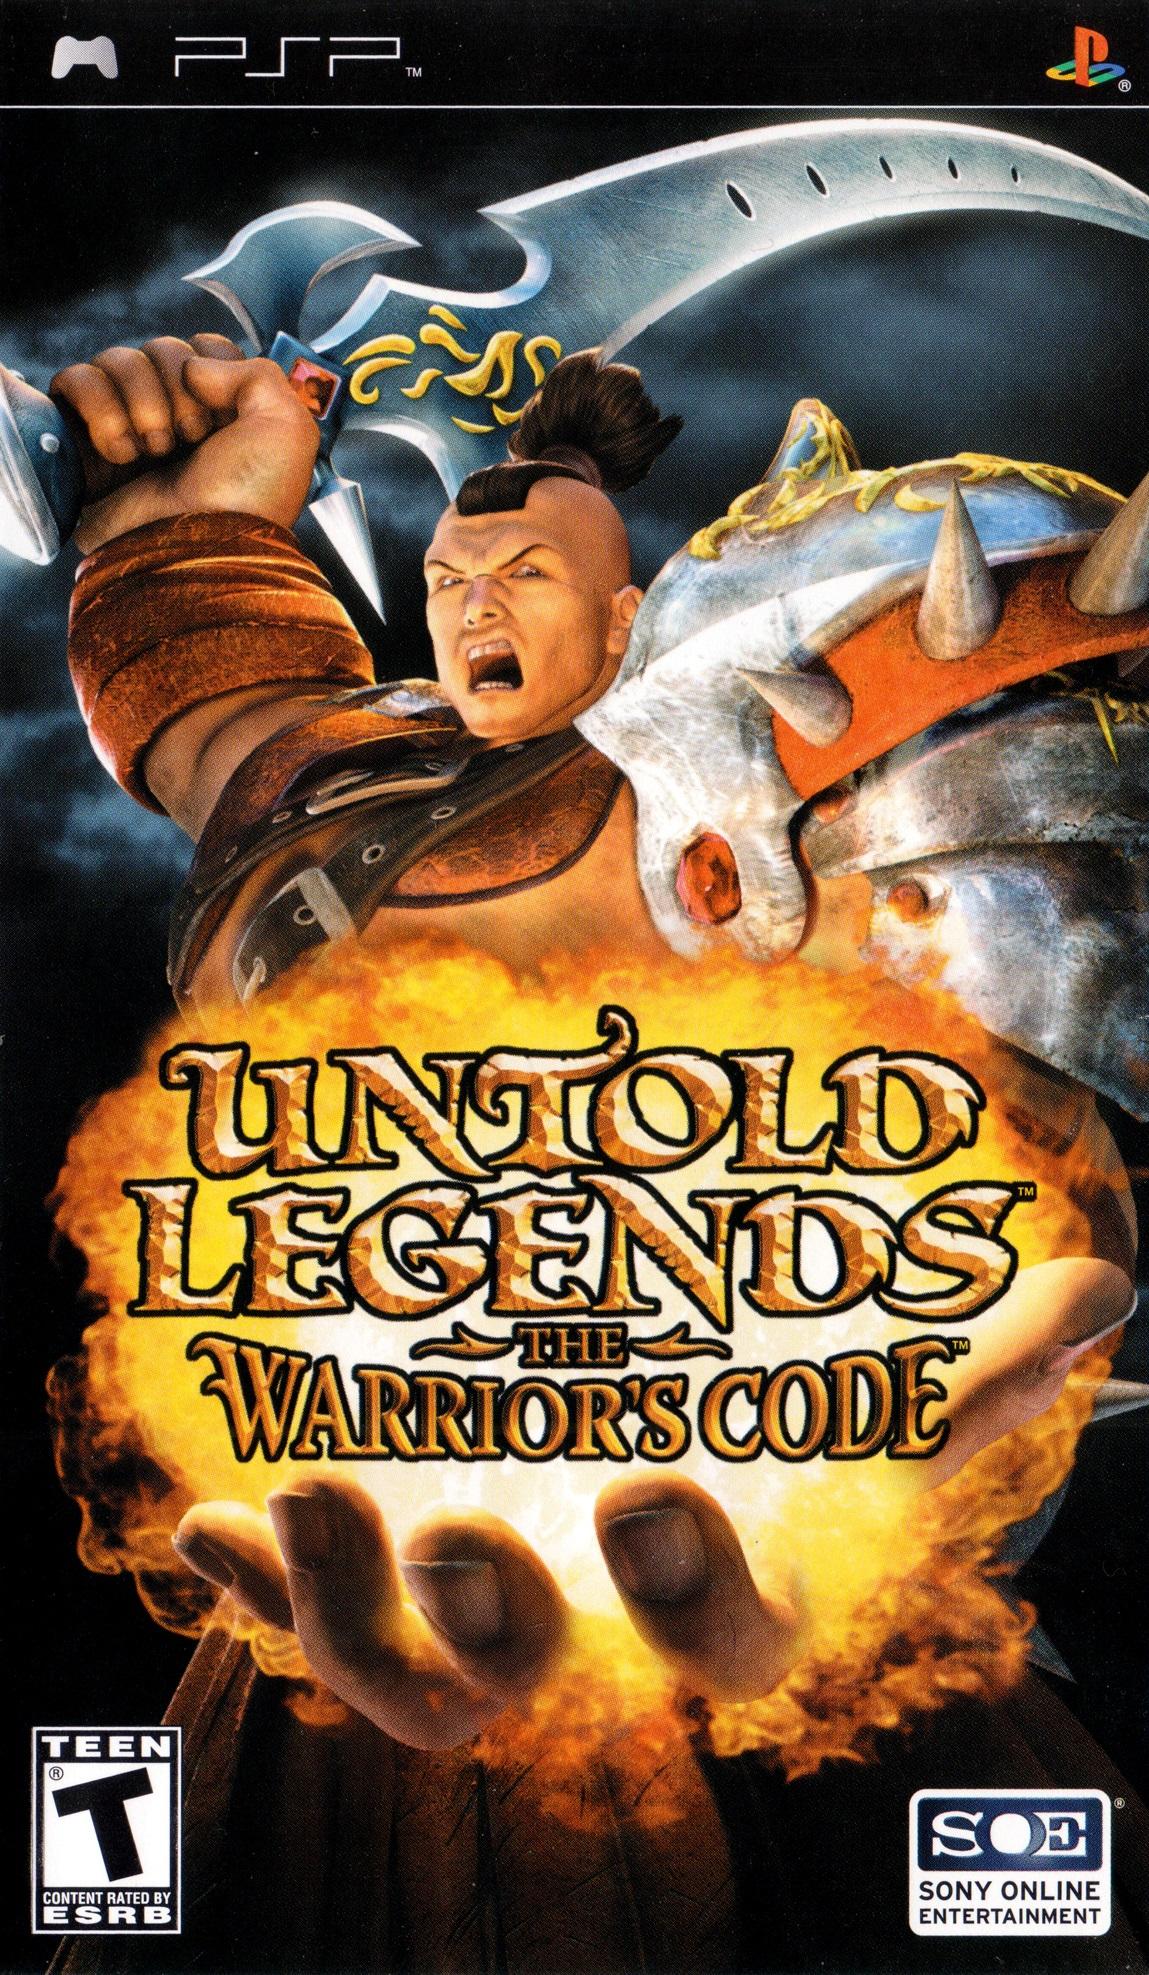 Untold Legends The Warrior's Code PSP Game